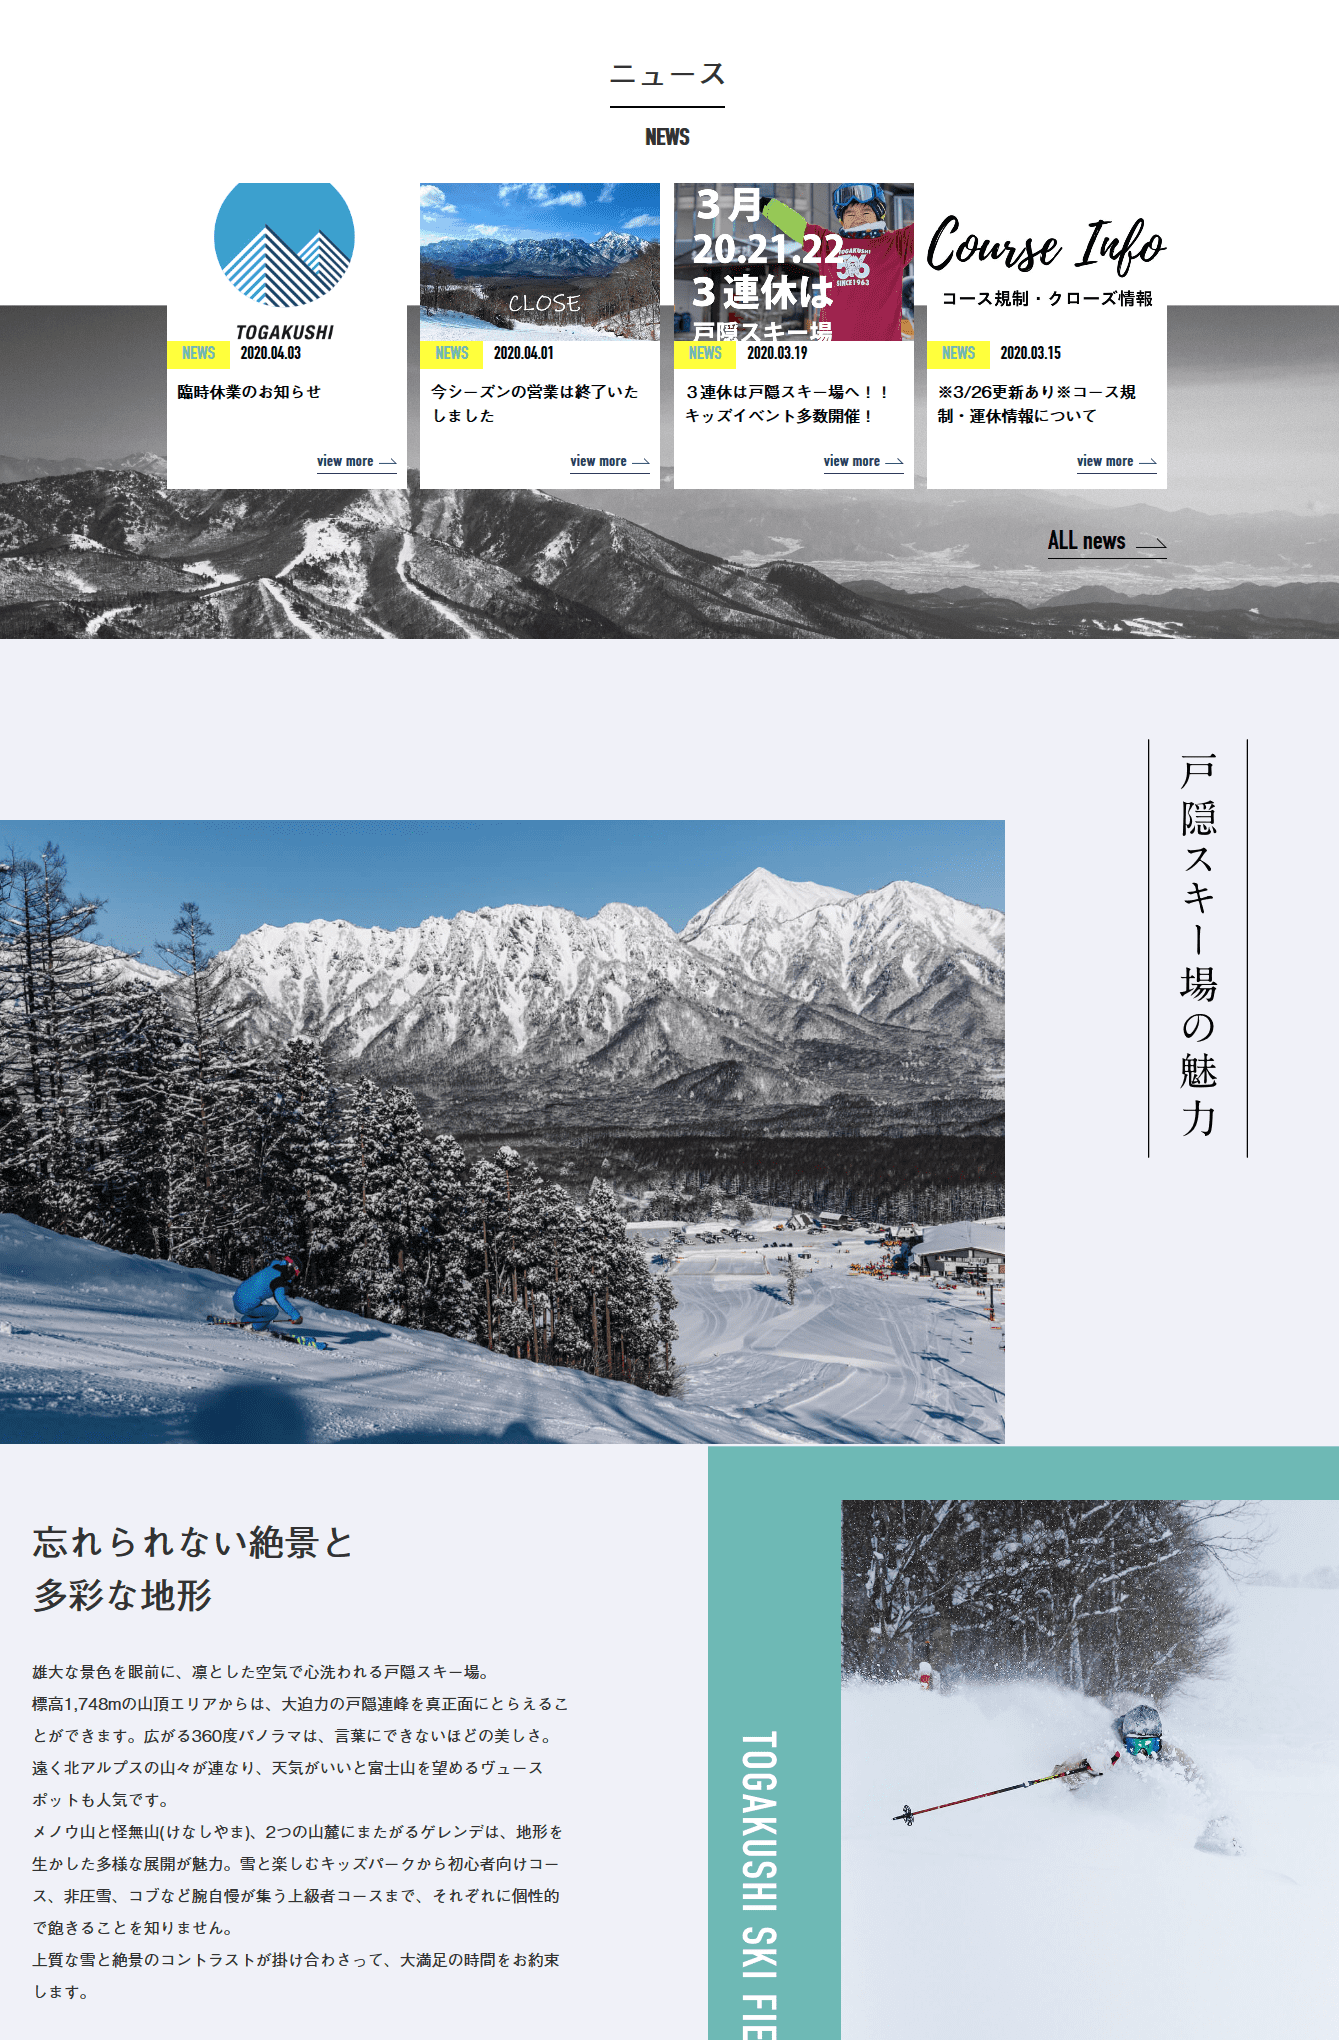 戸隠 スキー 場